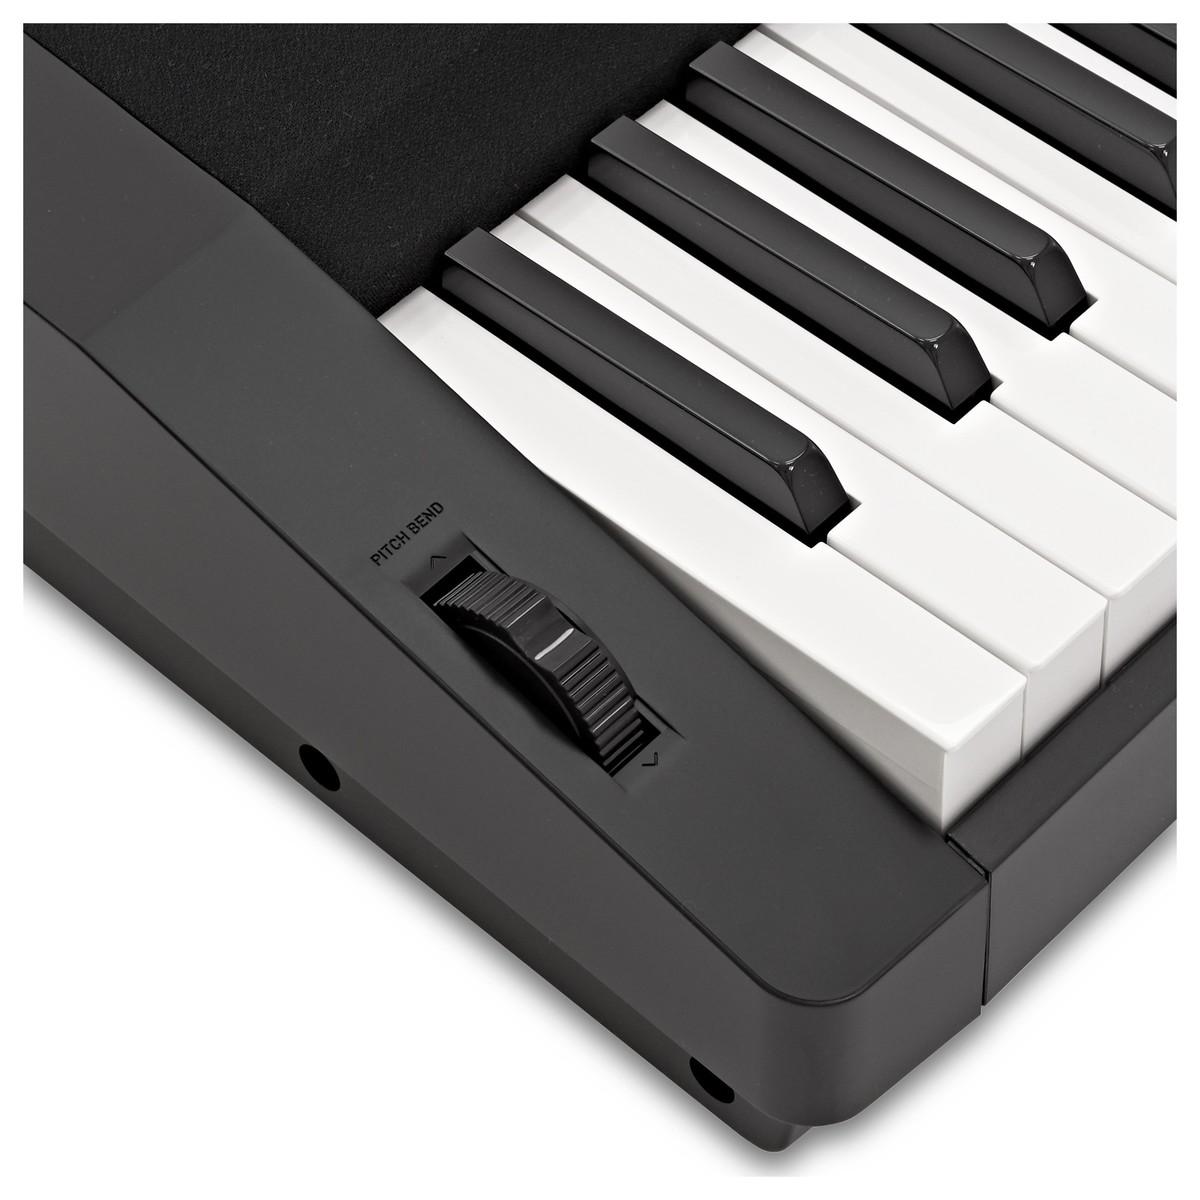 casio cdp 230r digital piano black at gear4music. Black Bedroom Furniture Sets. Home Design Ideas